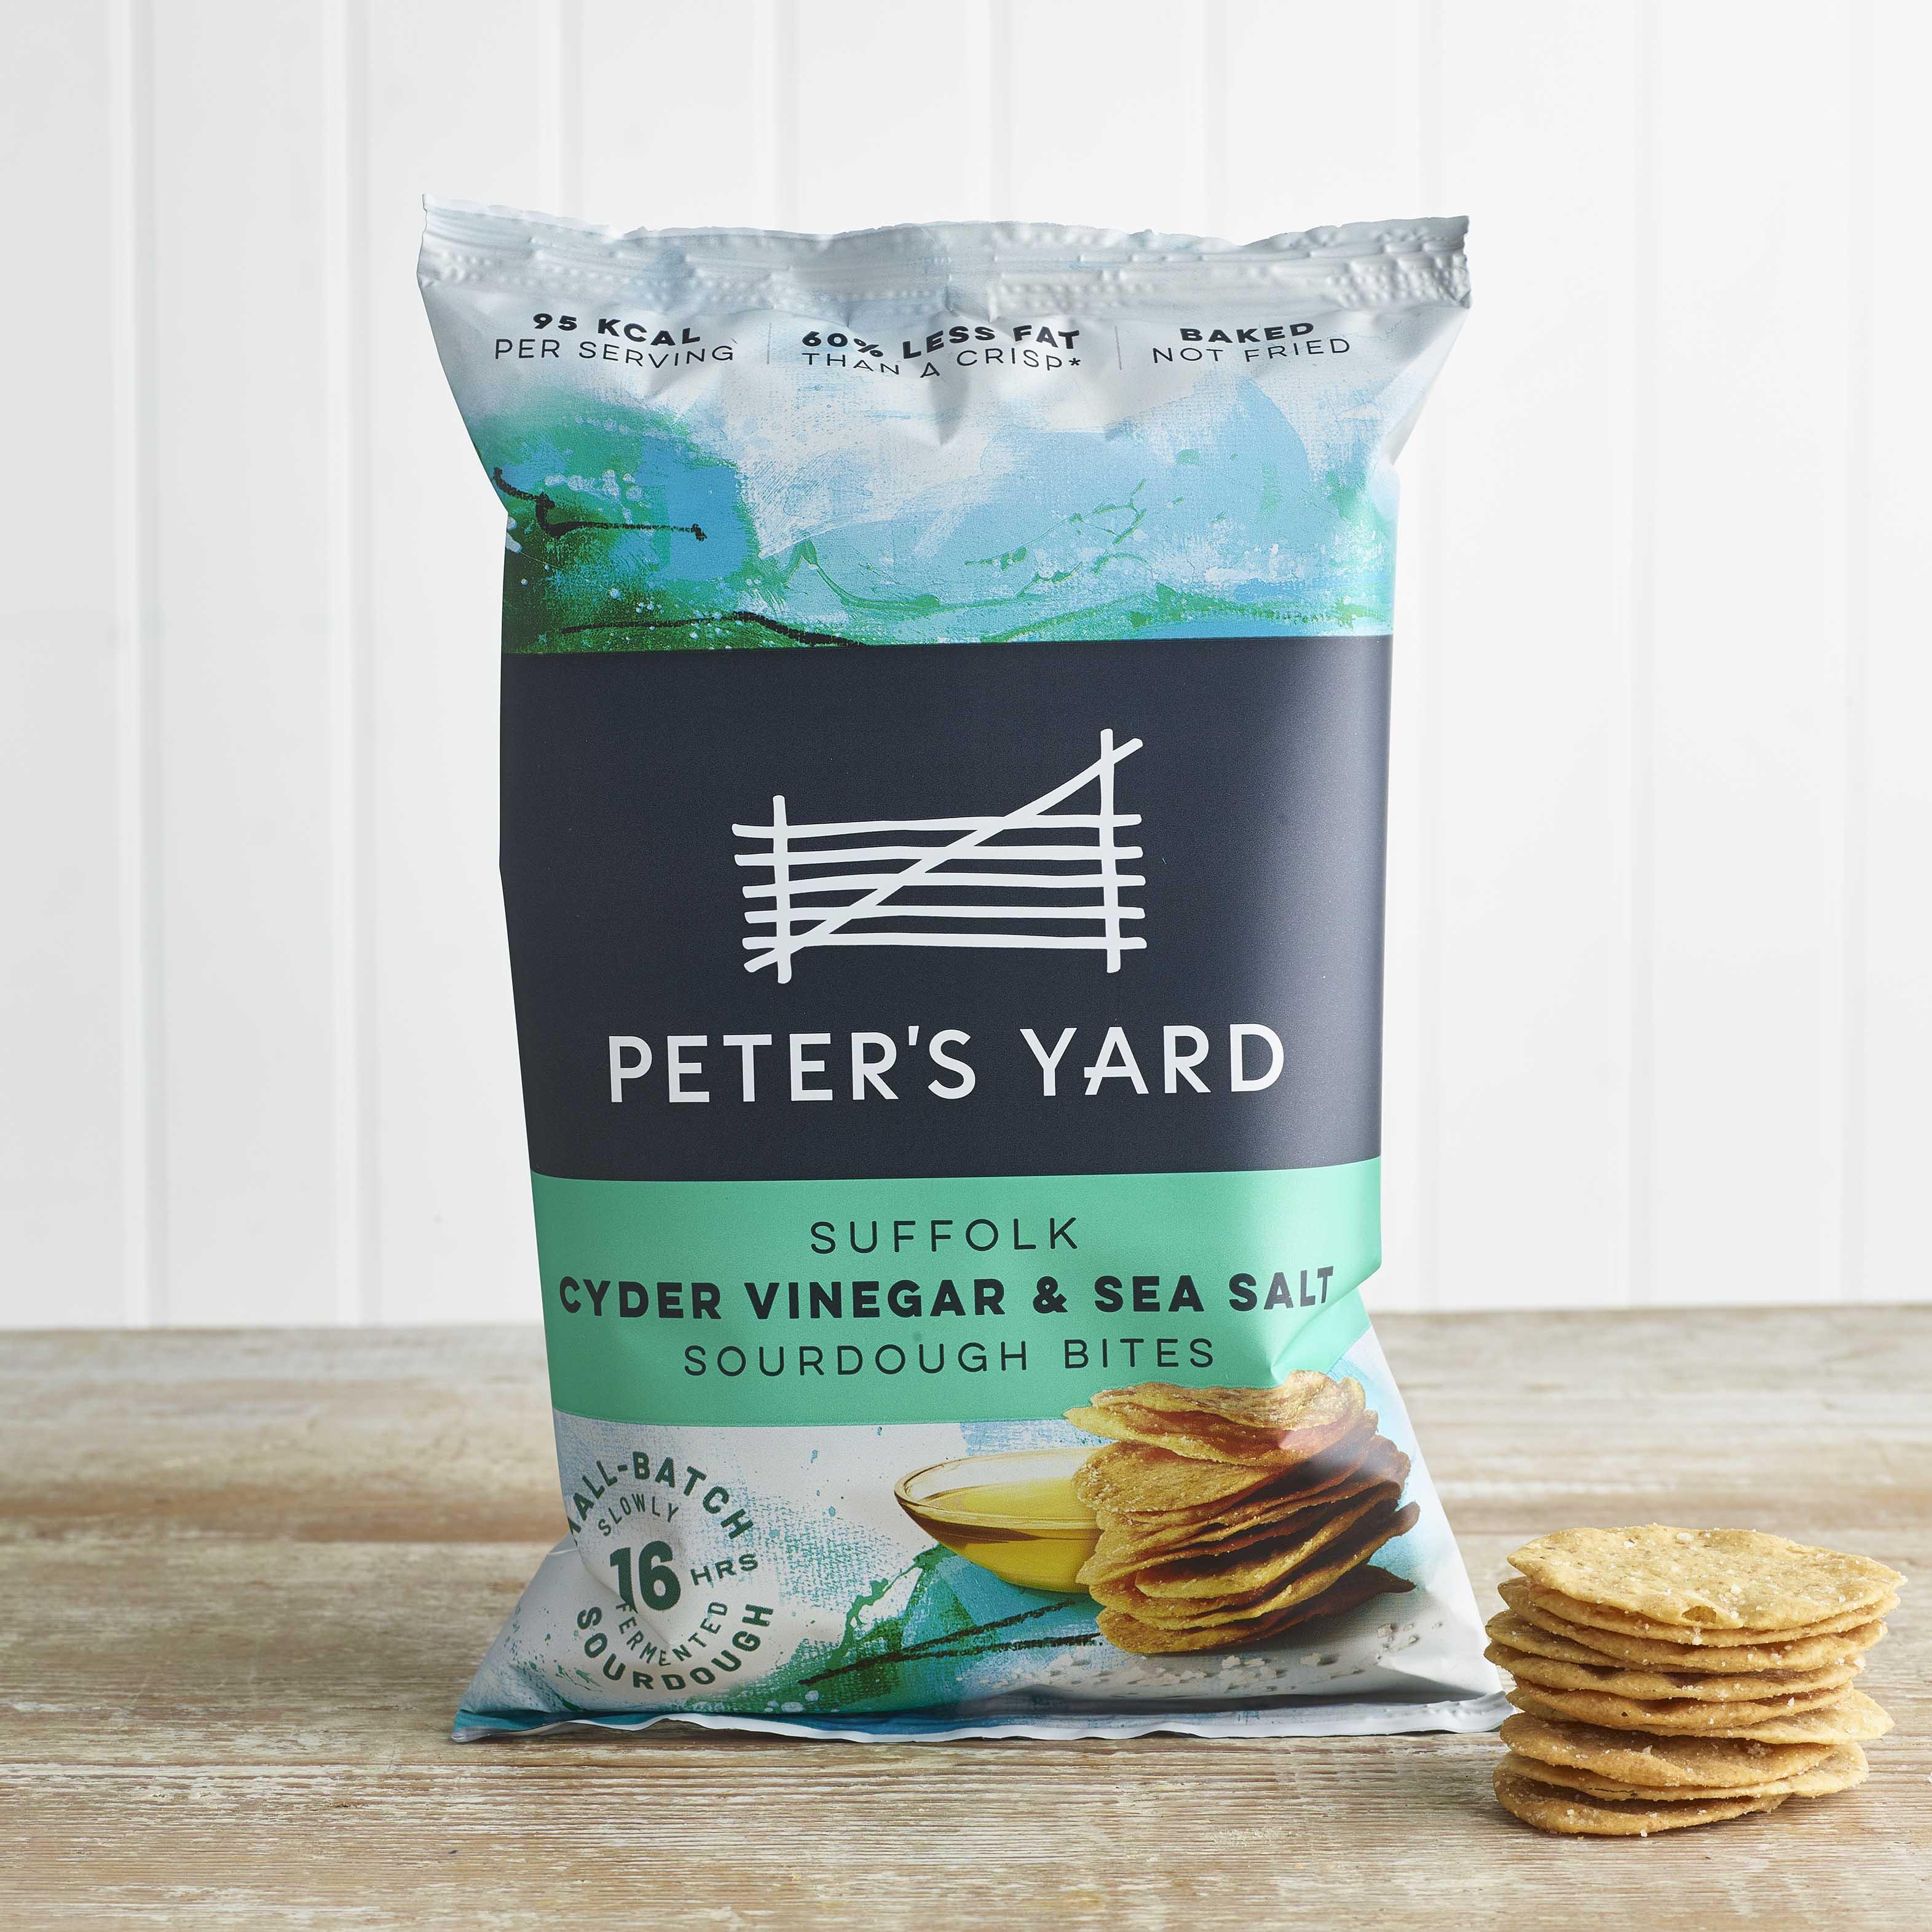 Peter's Yard Suffolk Cyder Vinegar & Sea Salt Sourdough Bites, 90g